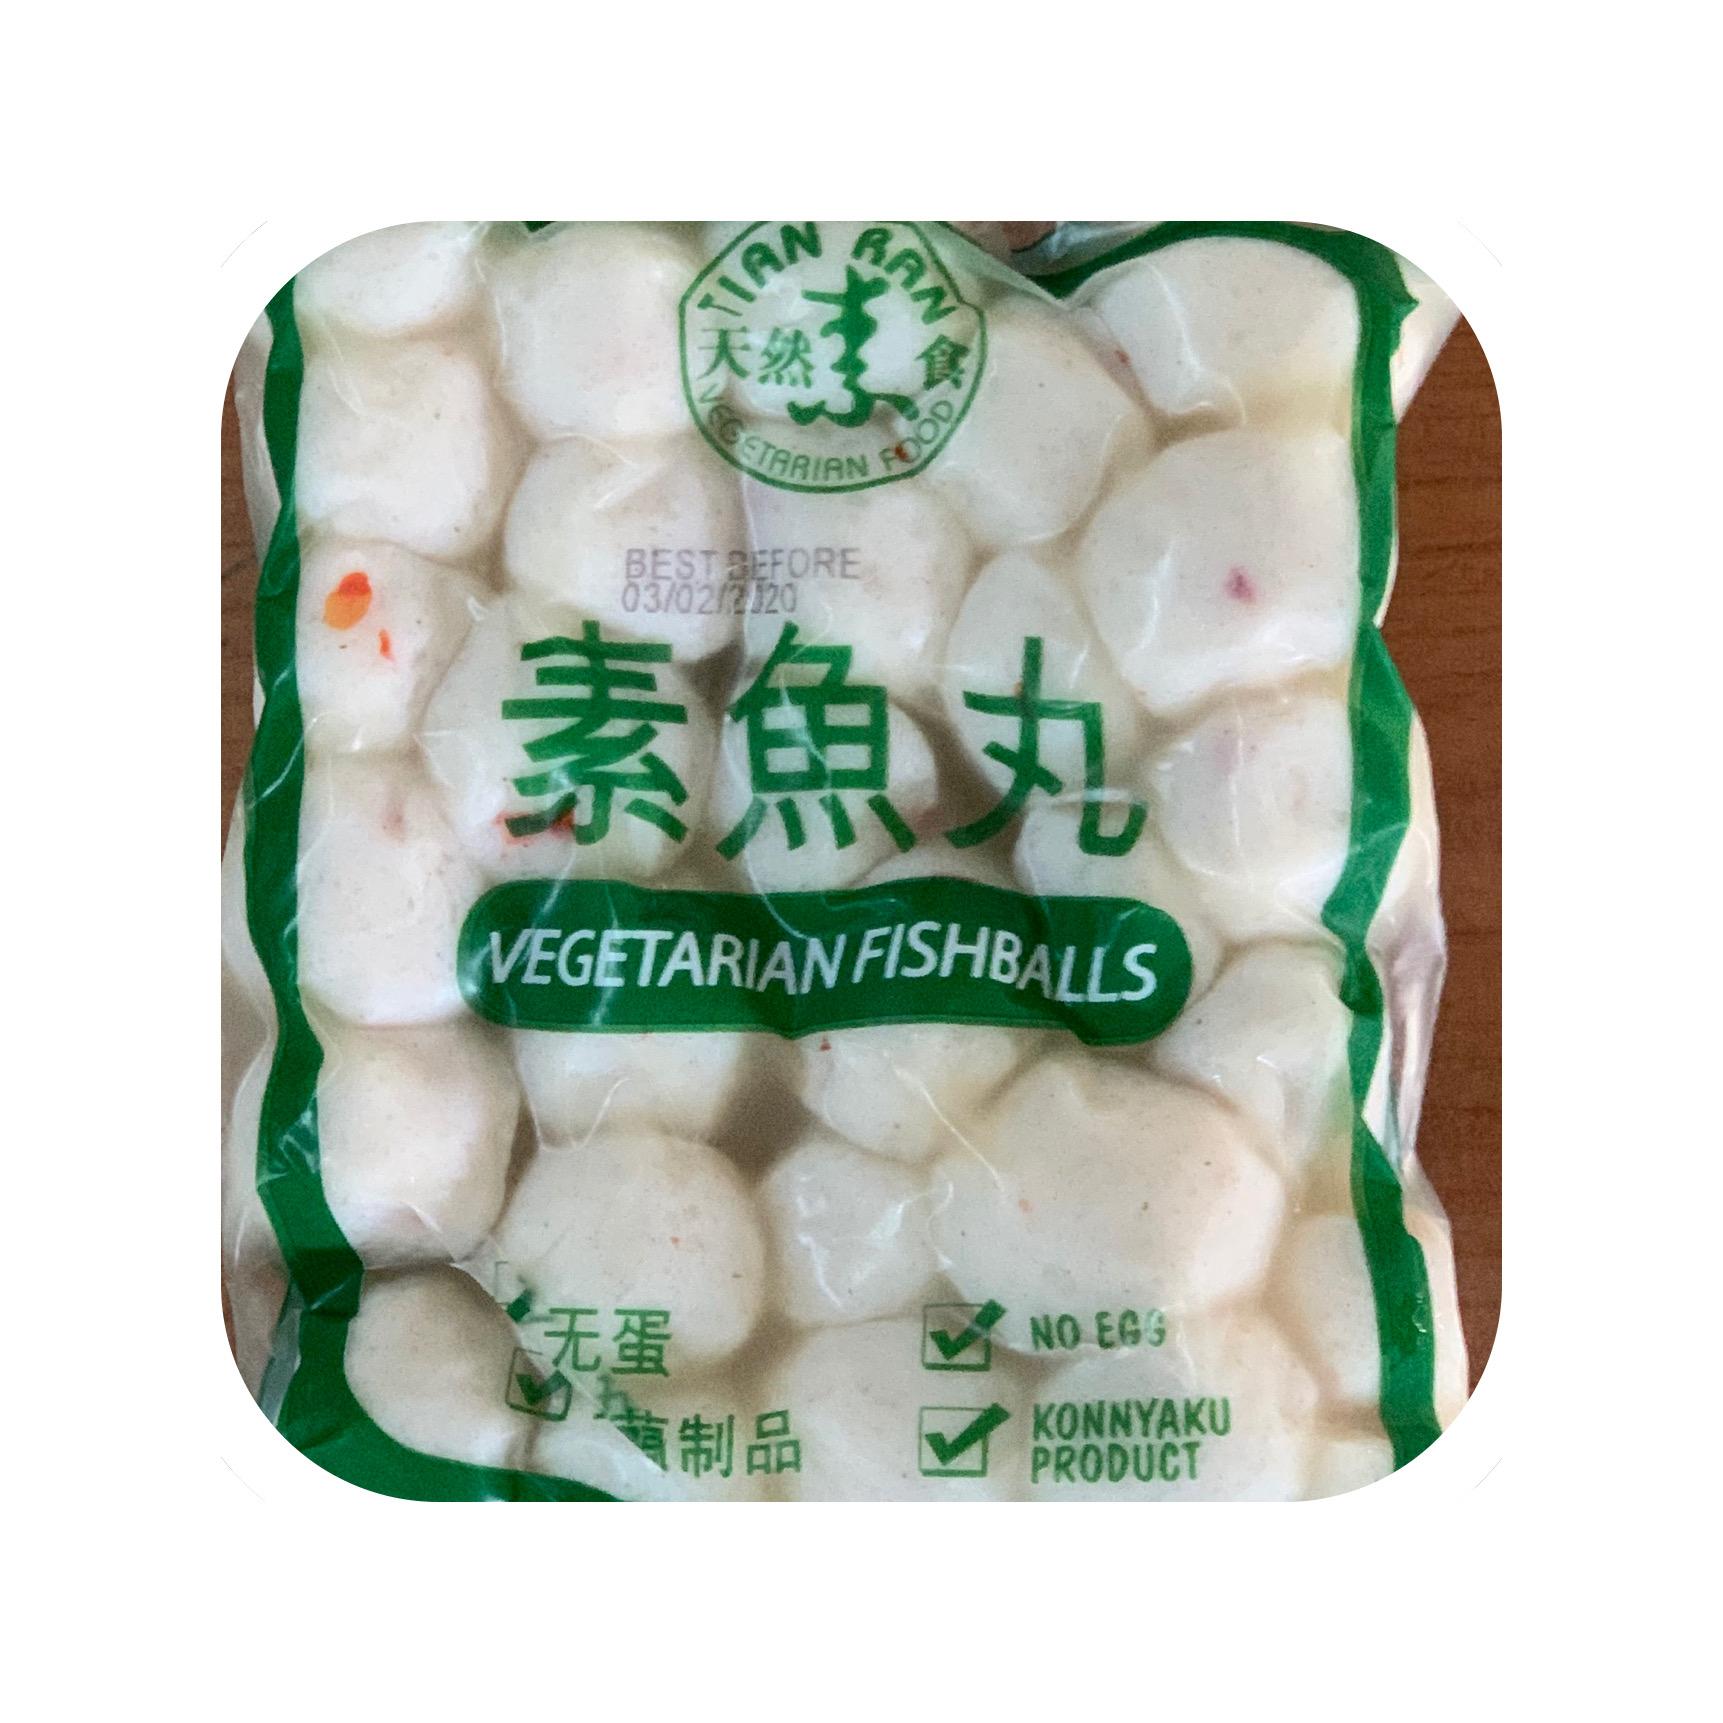 Image Vegetarian Fishball 天然-素鱼丸 500grams